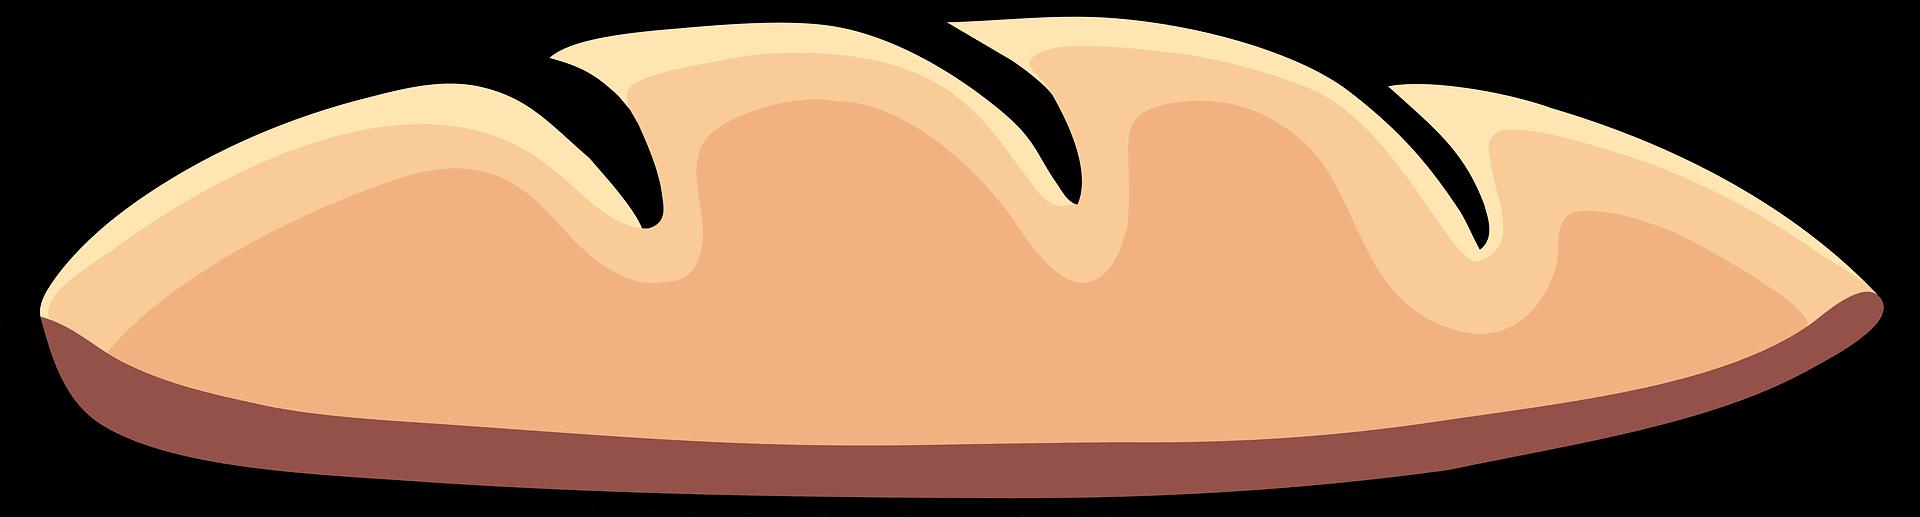 Bread clipart transparent 7